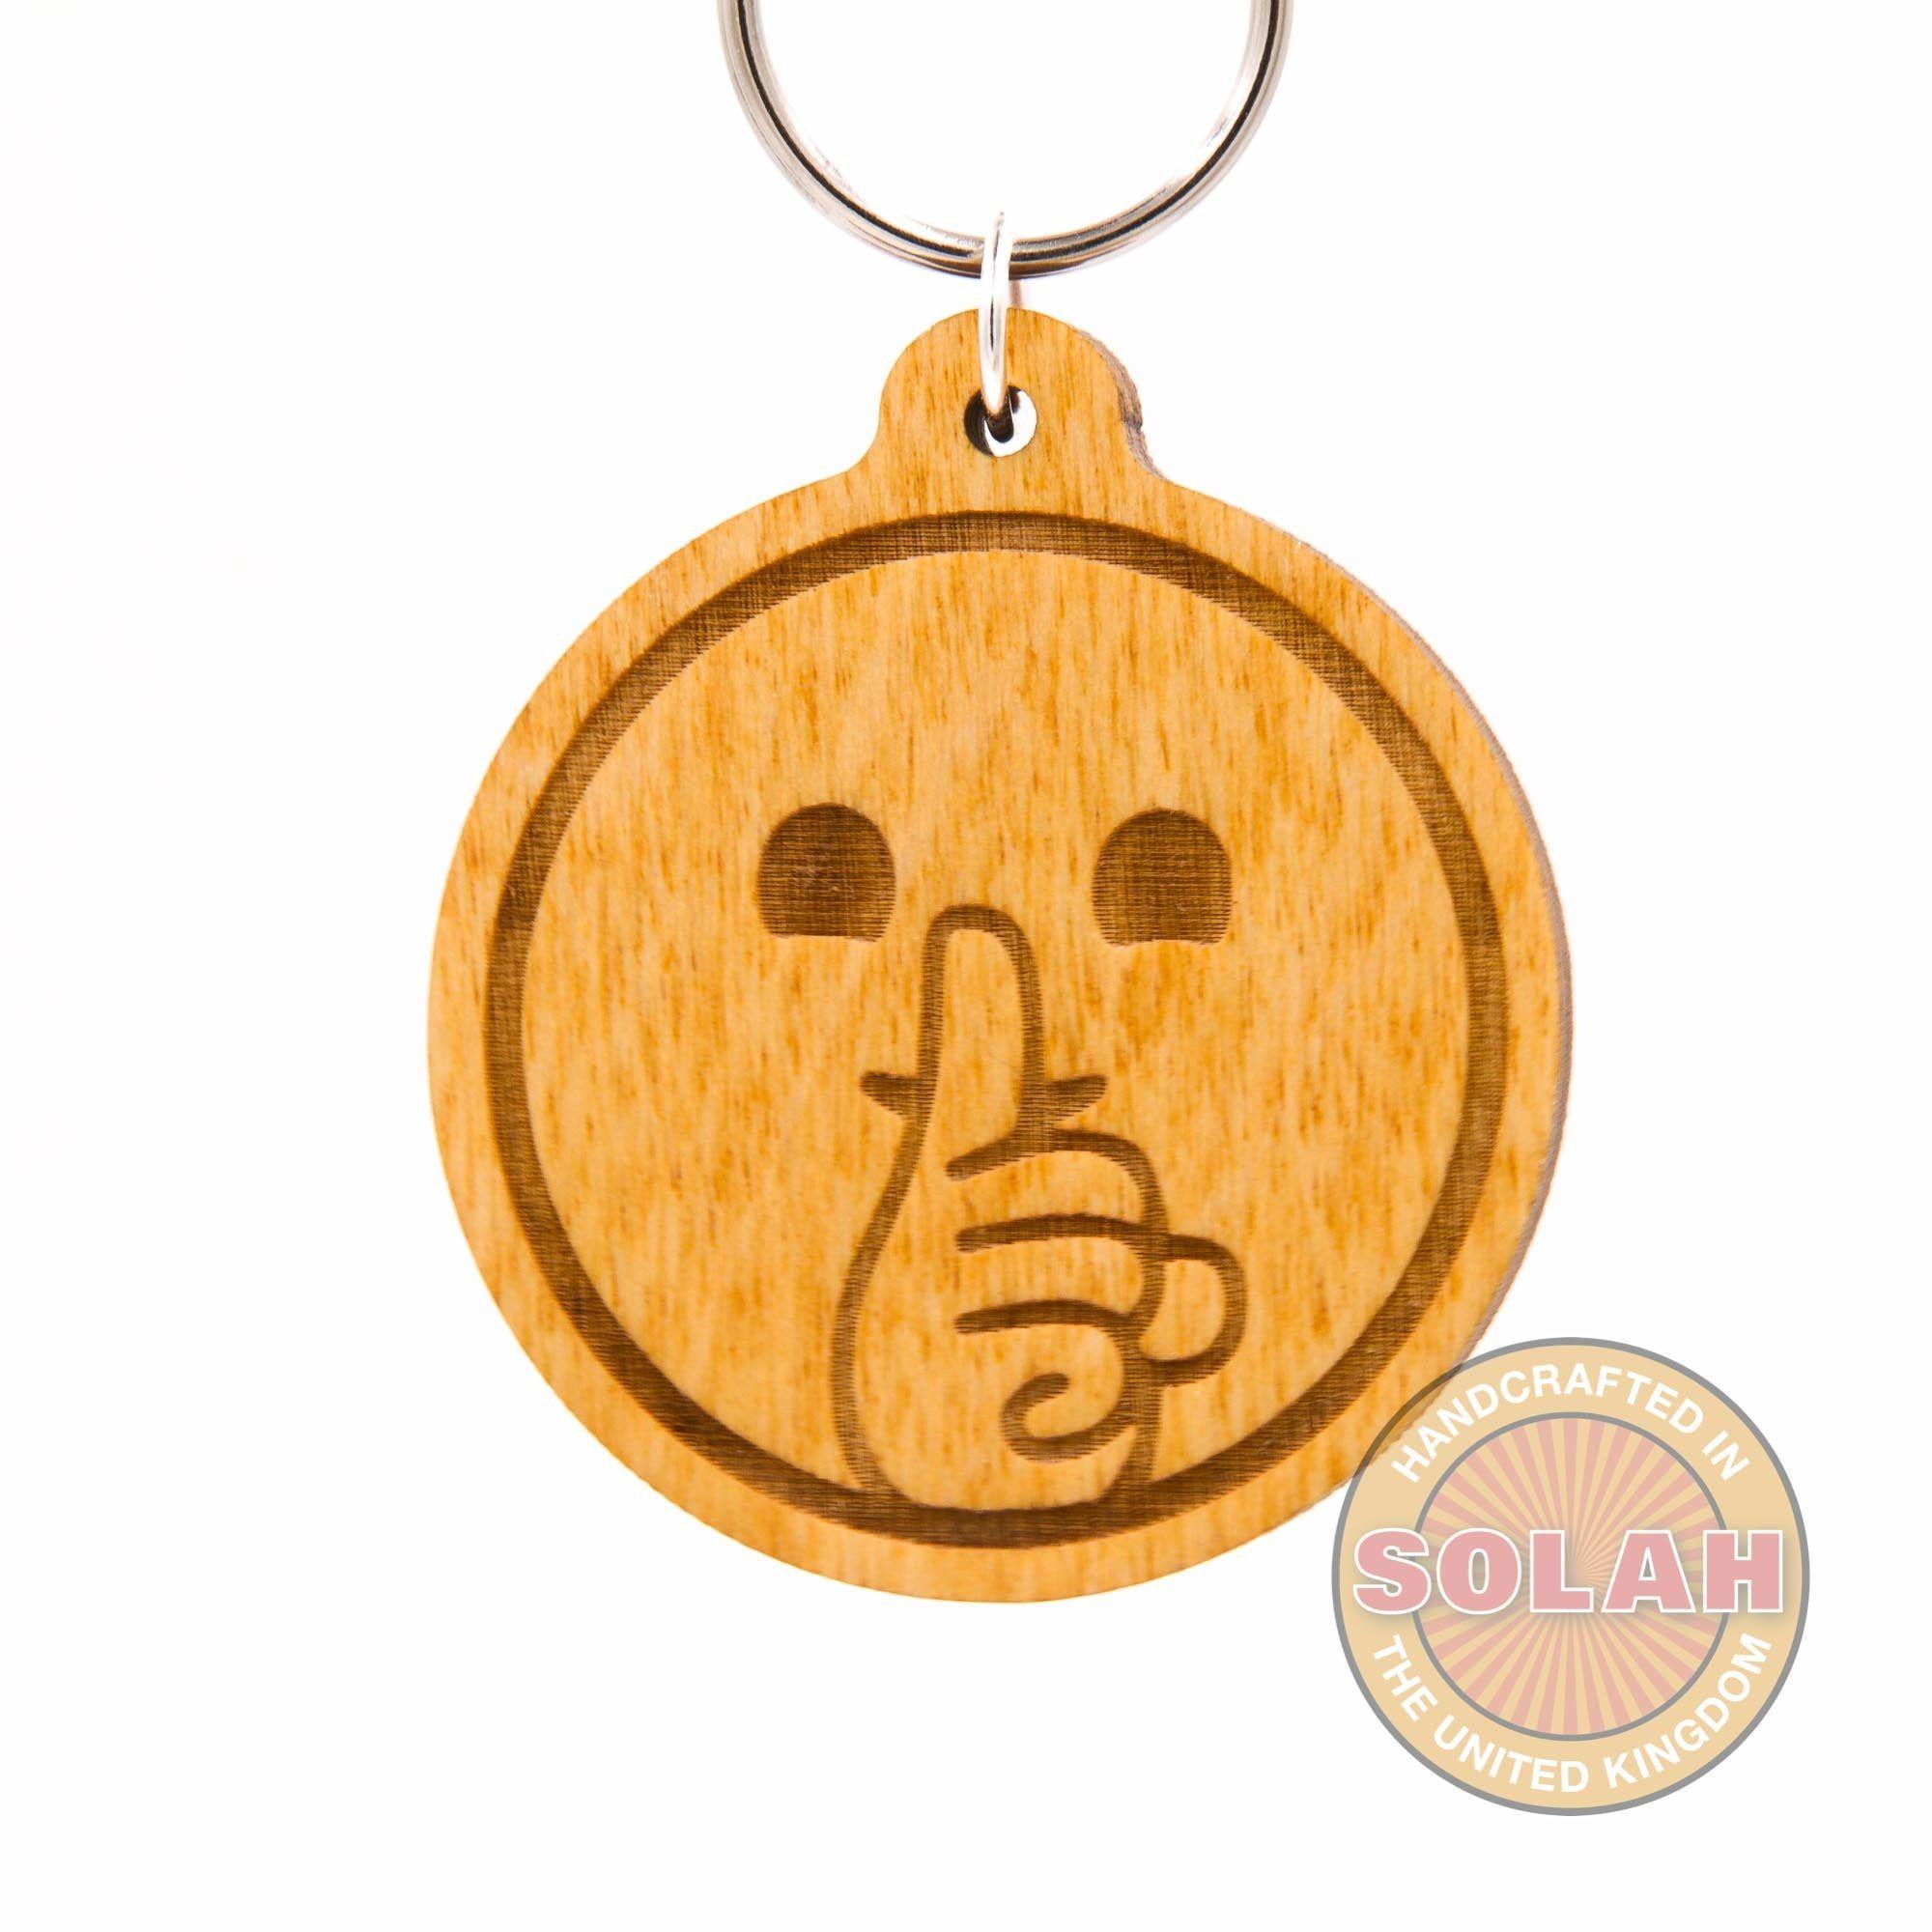 Shush Face Emoji Keychain Shh Emoji Shushing Face Emoji Etsy Emoji Shh Emoji Wood Keychain